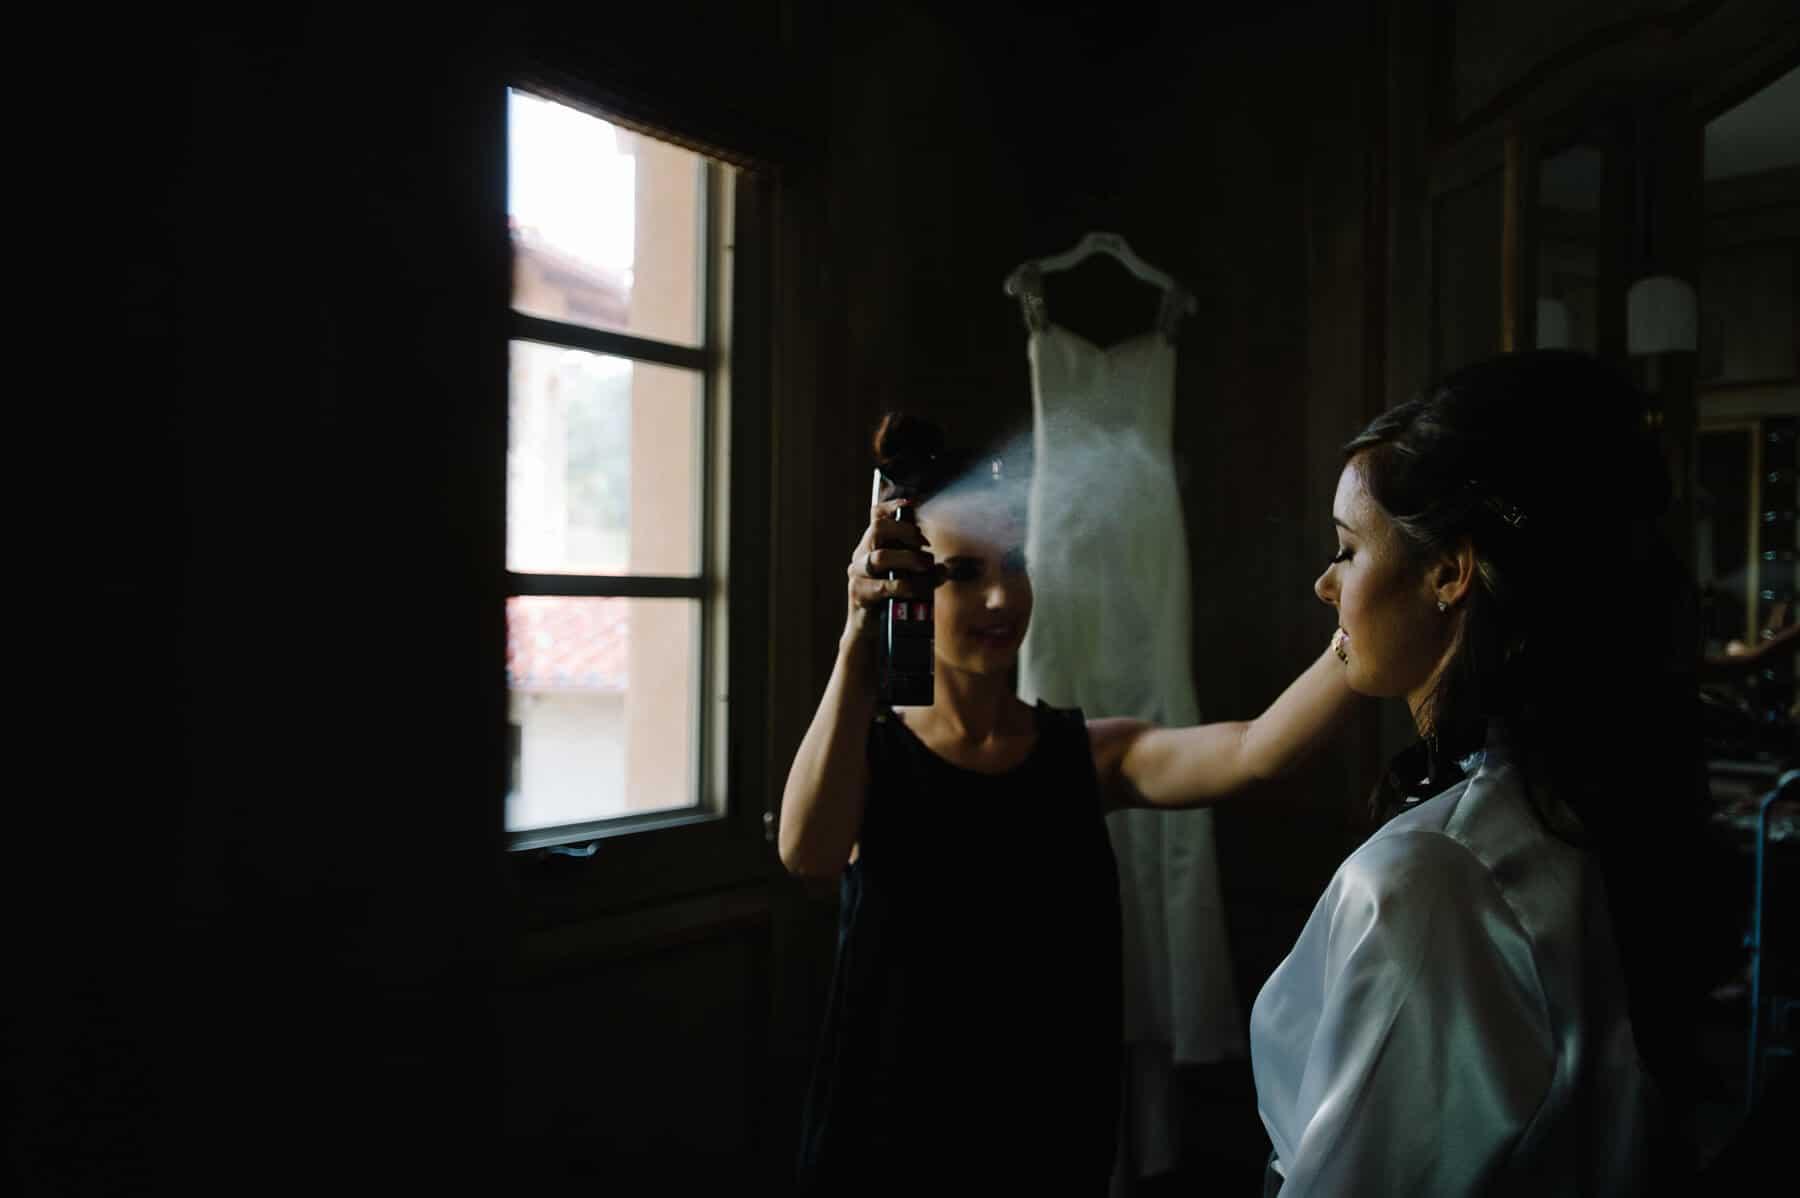 hair stylist spraying hairspray on bride's hair